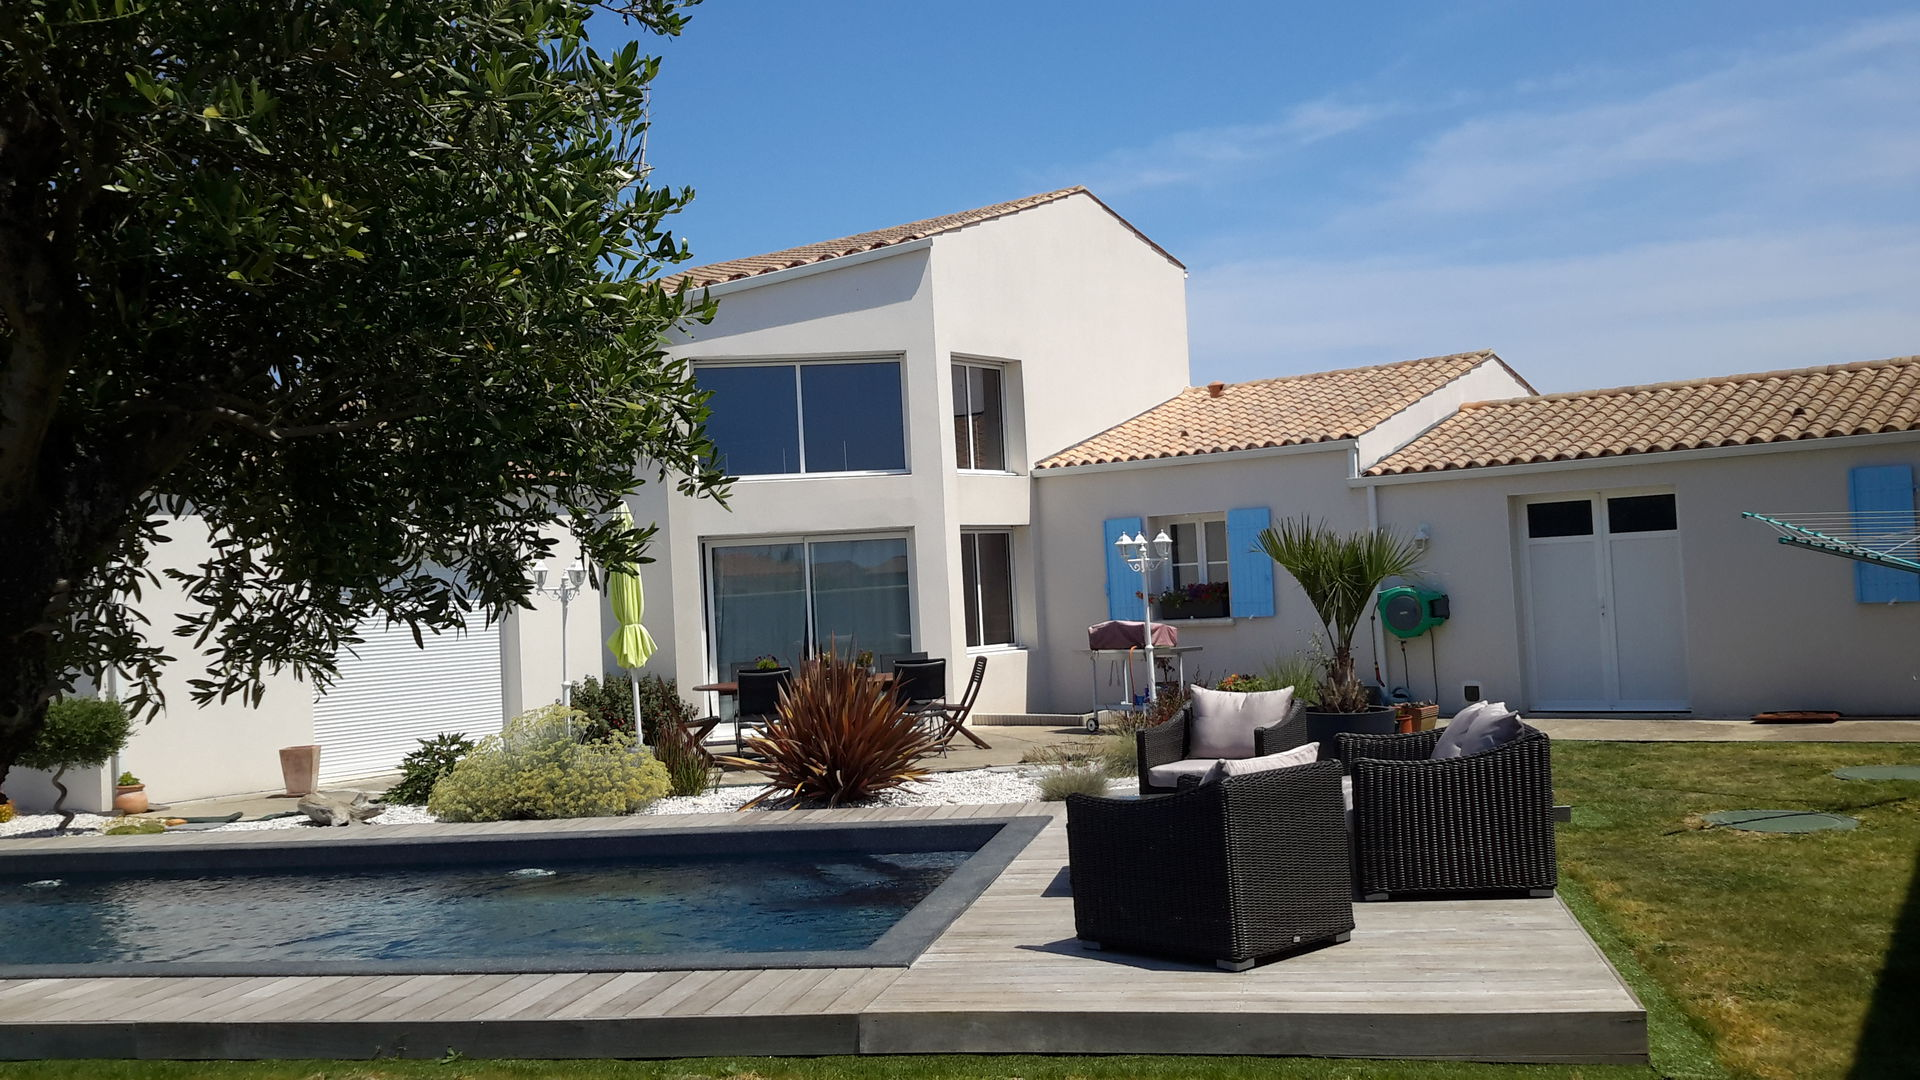 Maison Contemporaine Avec 4 Chambres A 10 Mn De La Rochelle Boligbytte